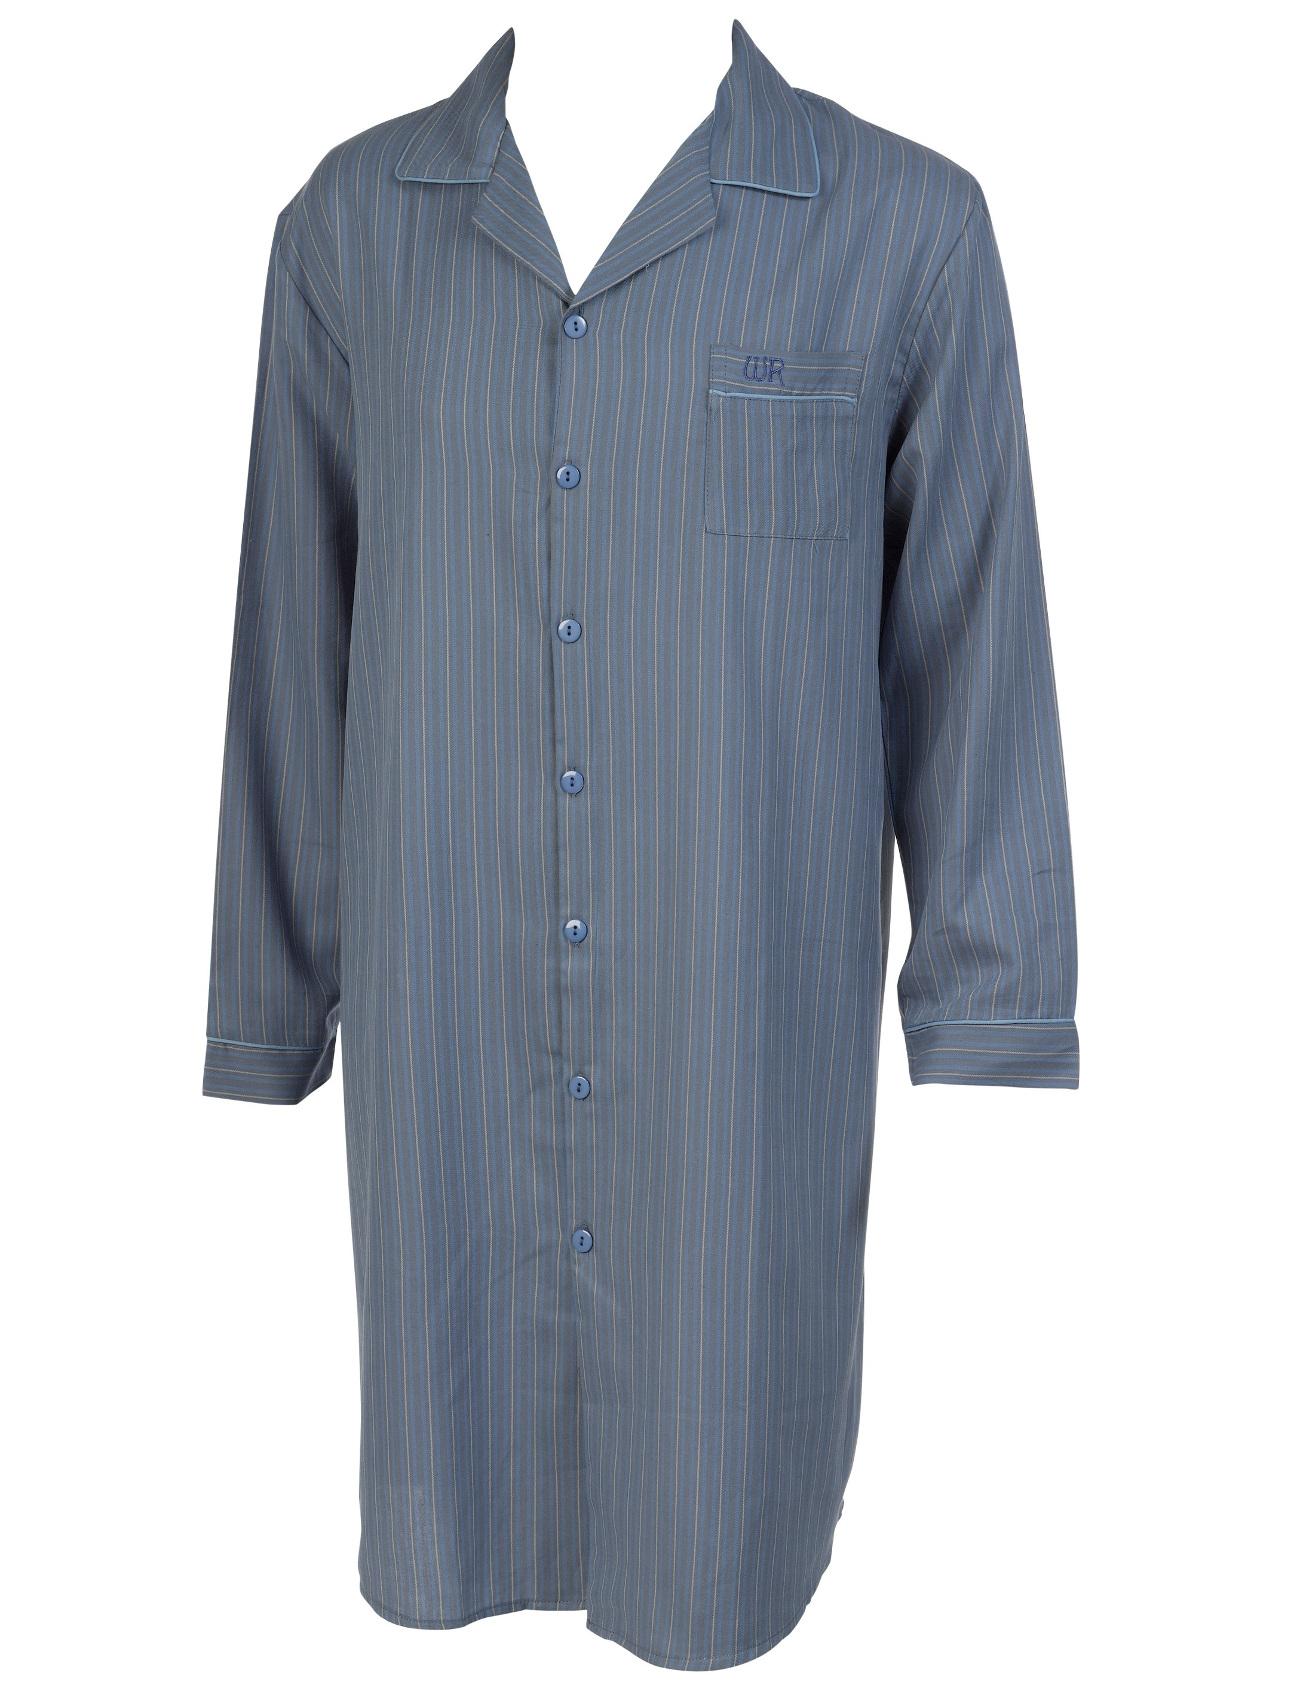 Striped mens night shirt 100 cotton walker reid button up for Striped button up shirt mens